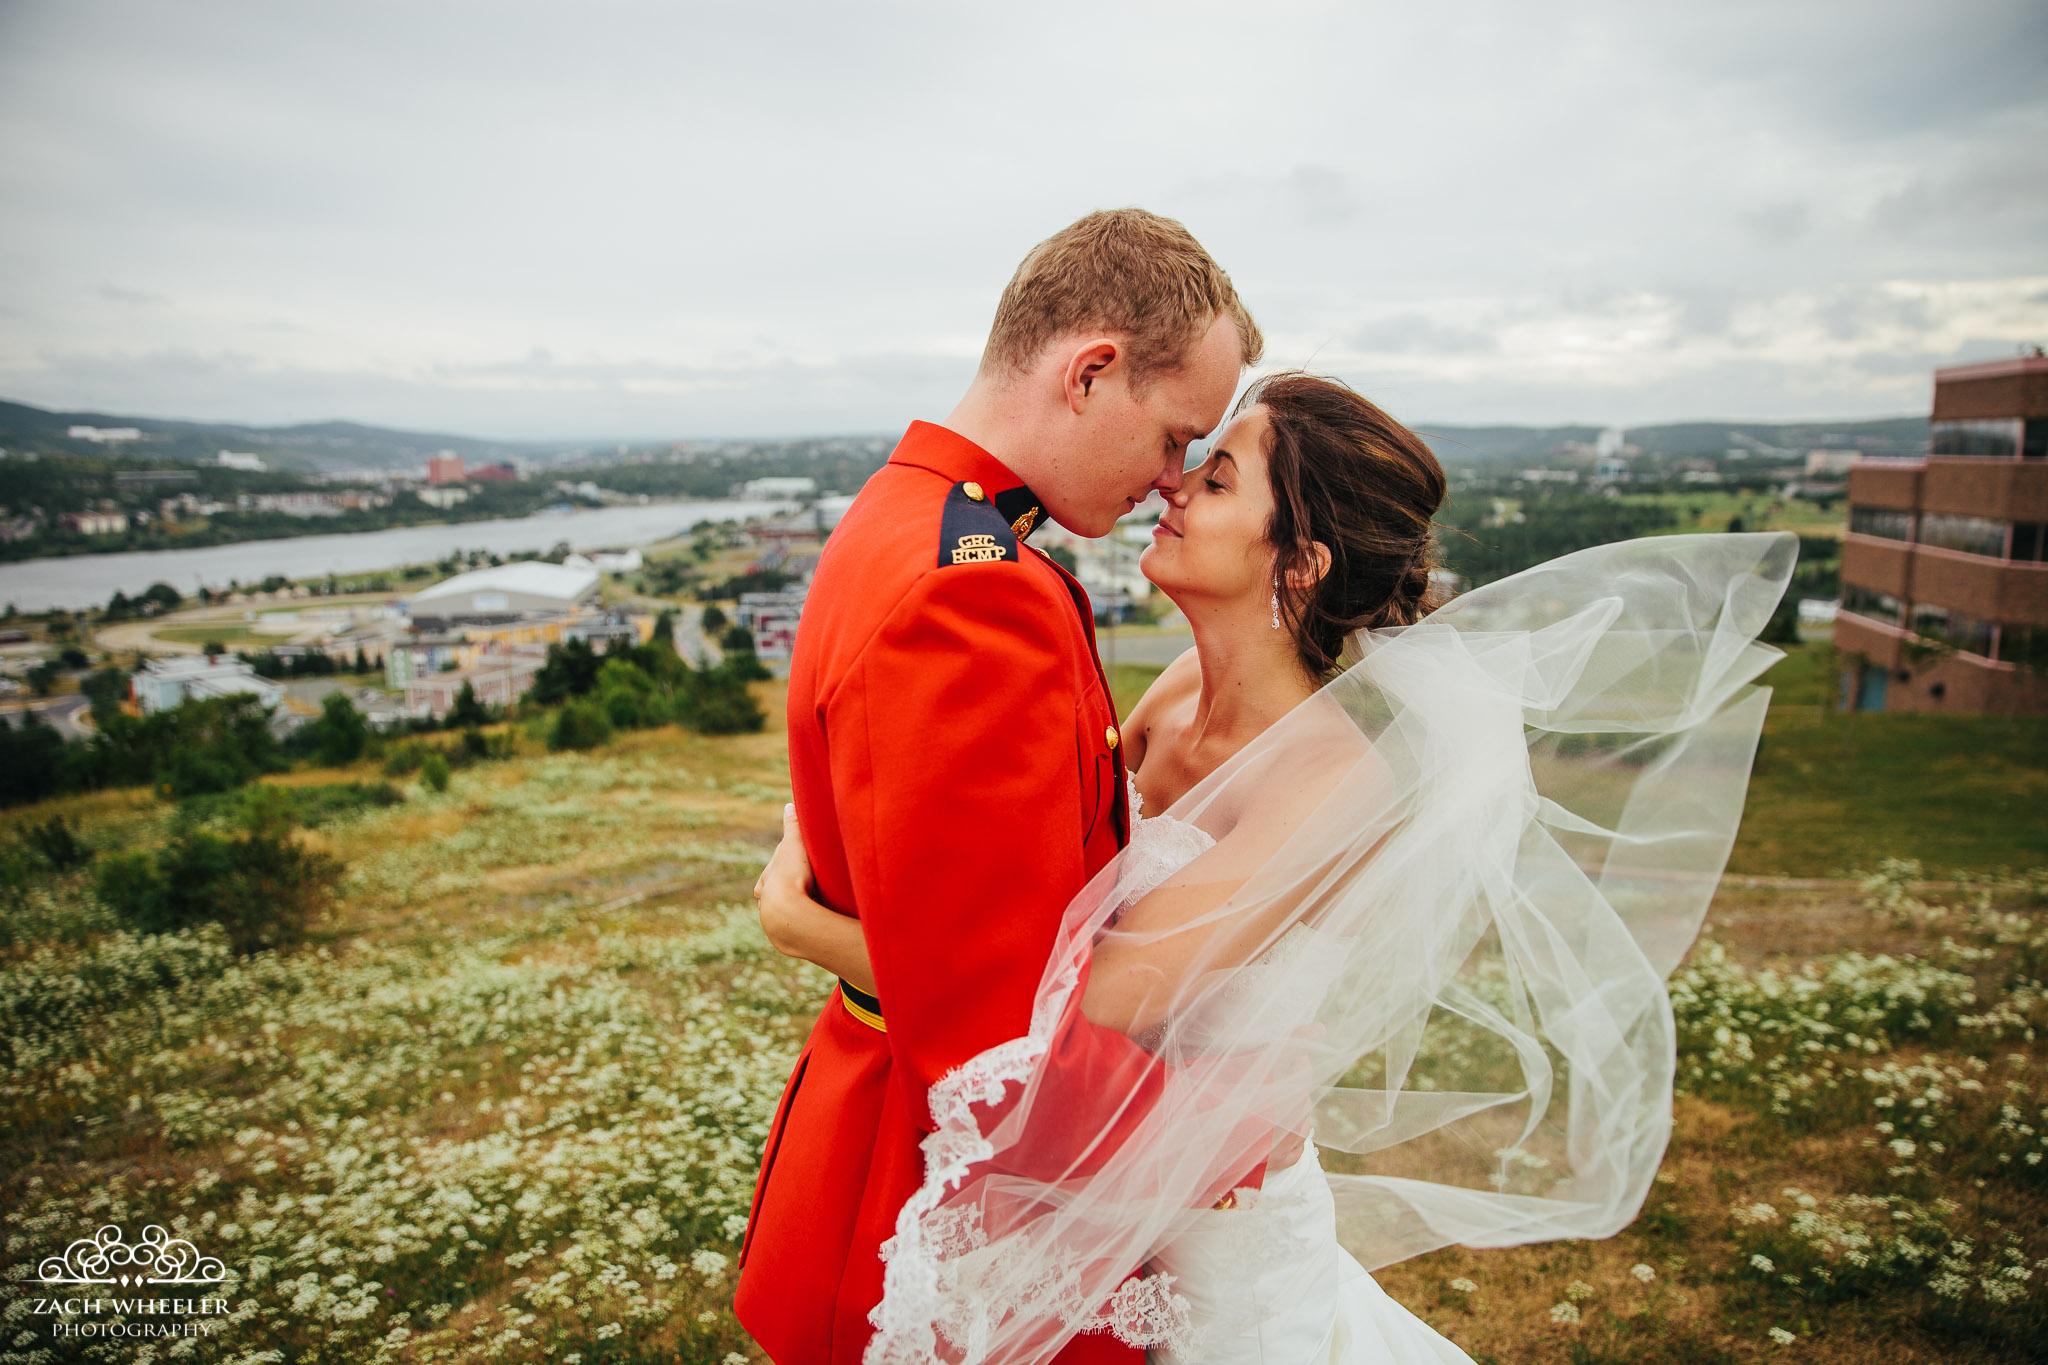 Laura-Benj-StJohns-Wedding-58